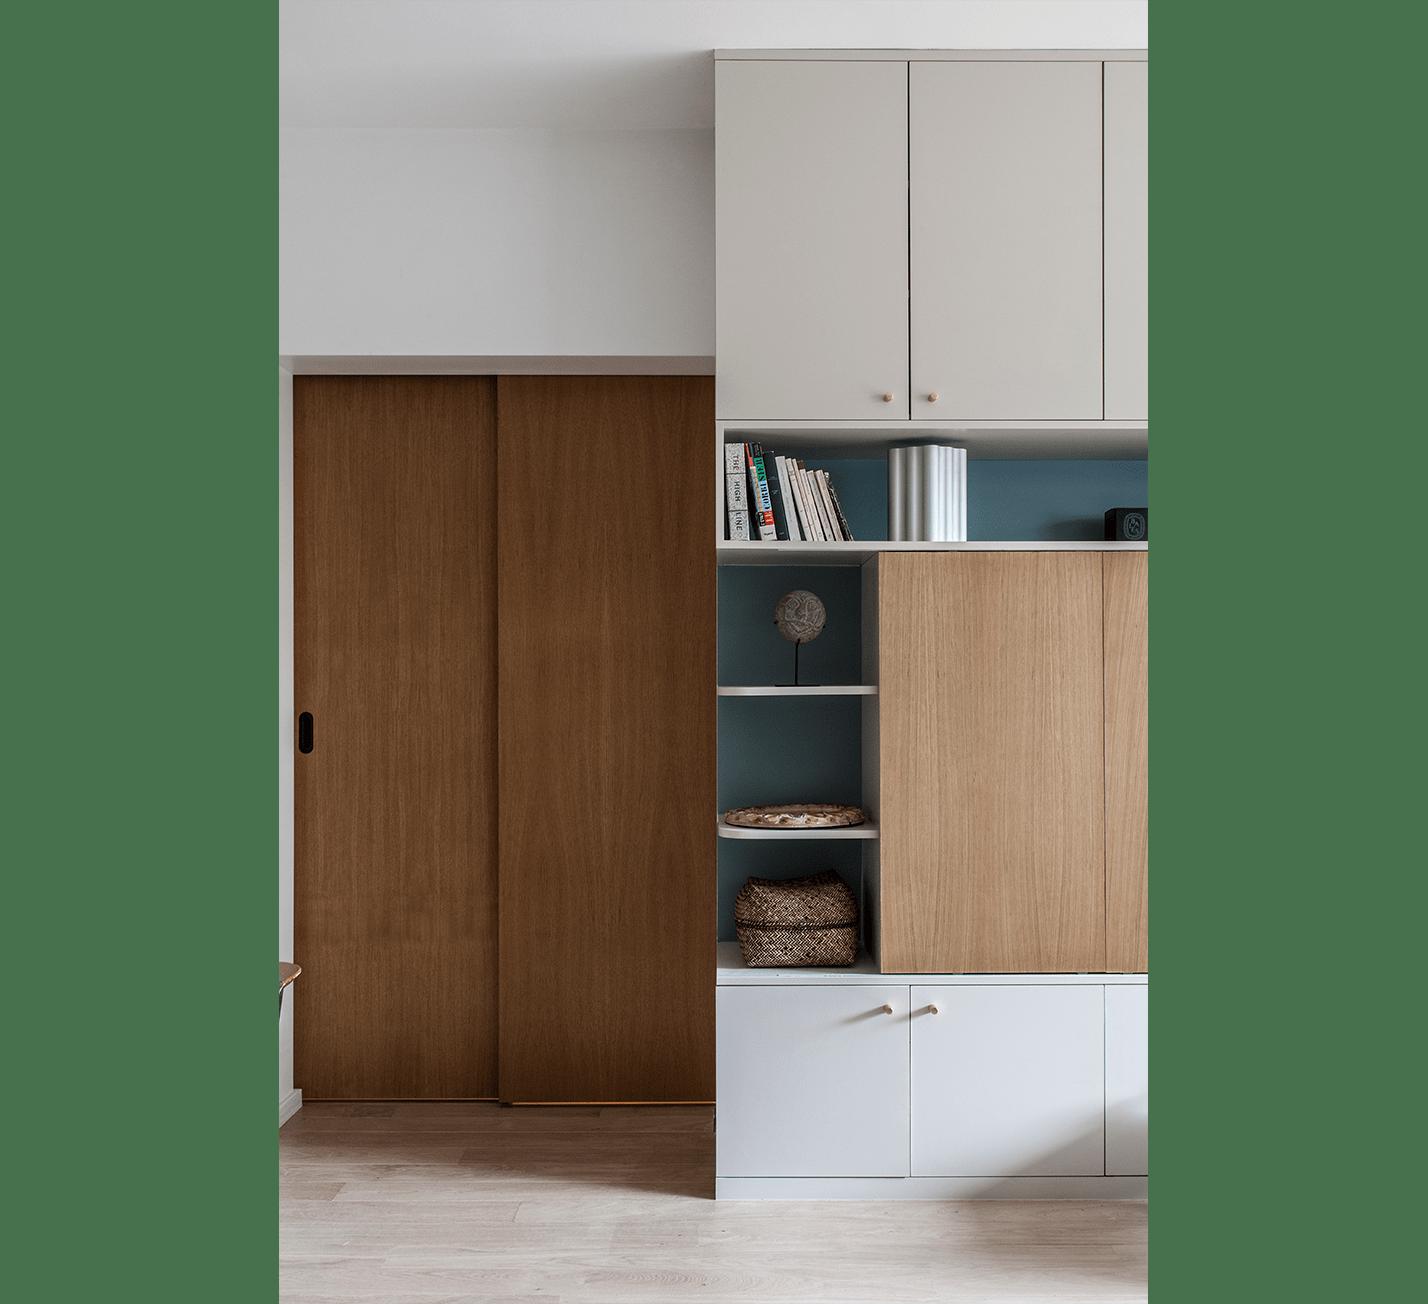 Projet-Albert-Atelier-Steve-Pauline-Borgia-Architecte-interieur-08-min-1